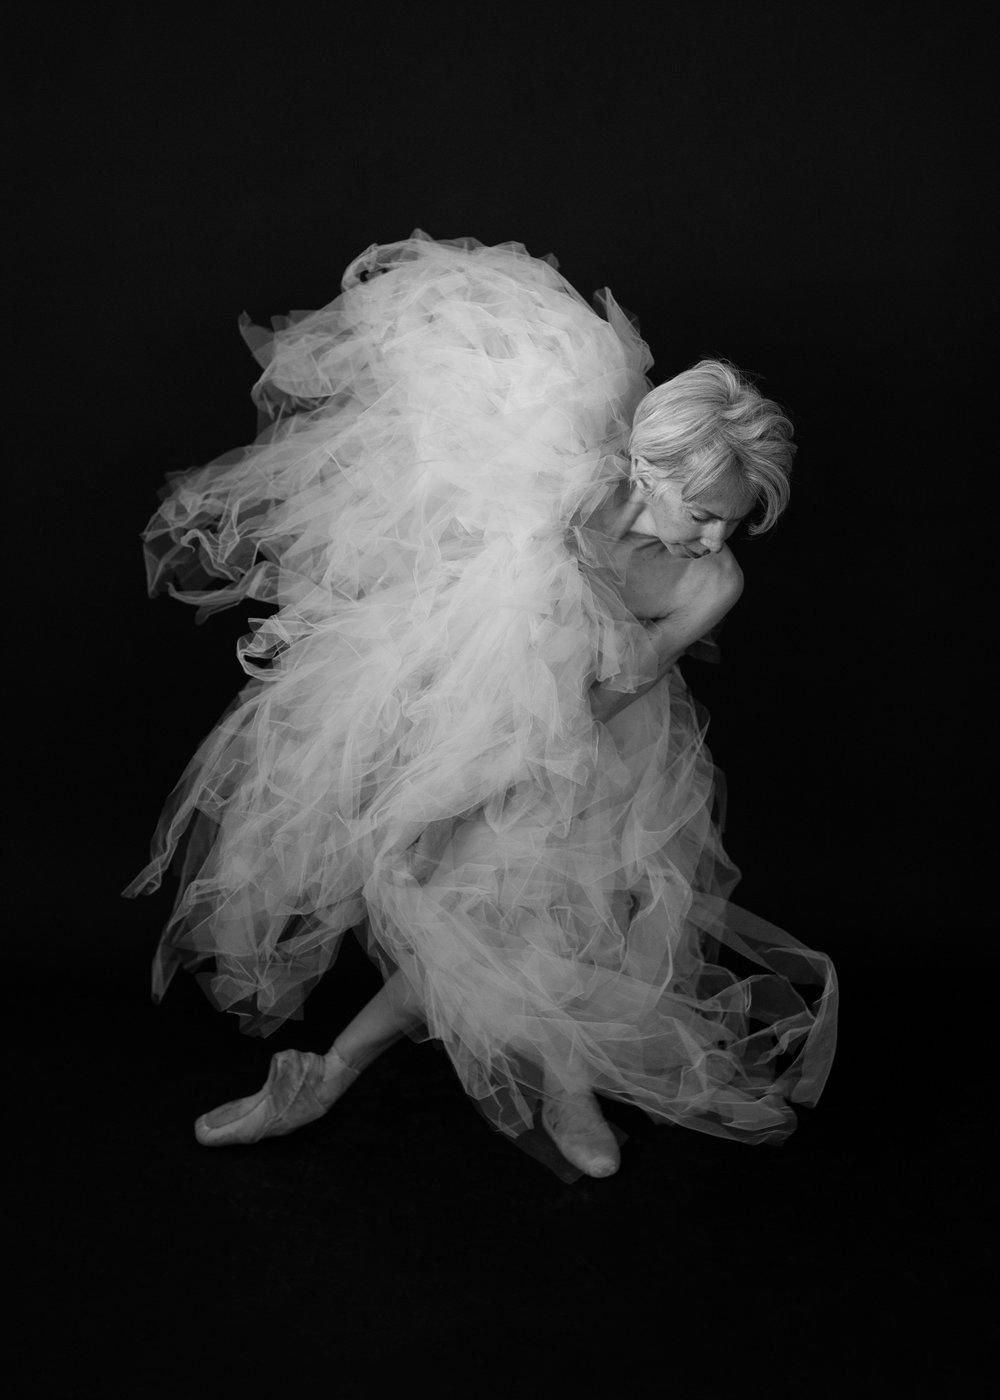 Valerie Madonia dances in tulle for Fine Art Photo Series with Denver photographer Jennifer Koskinen